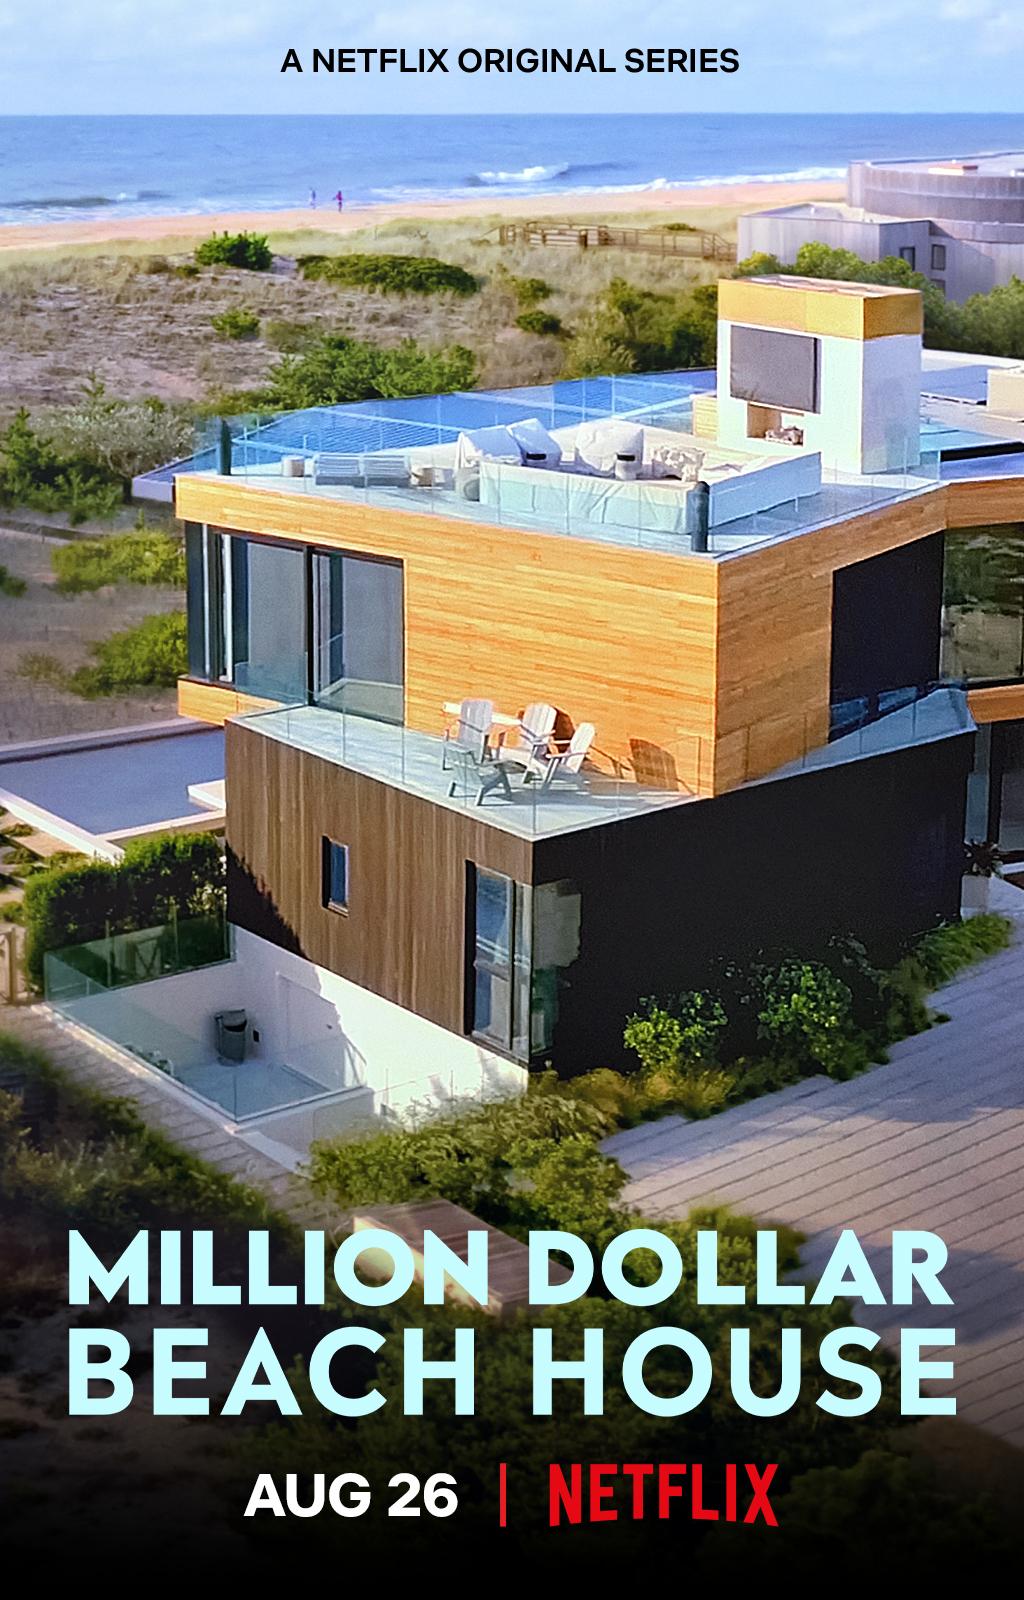 New On Netflix: Million Dollar Beach House